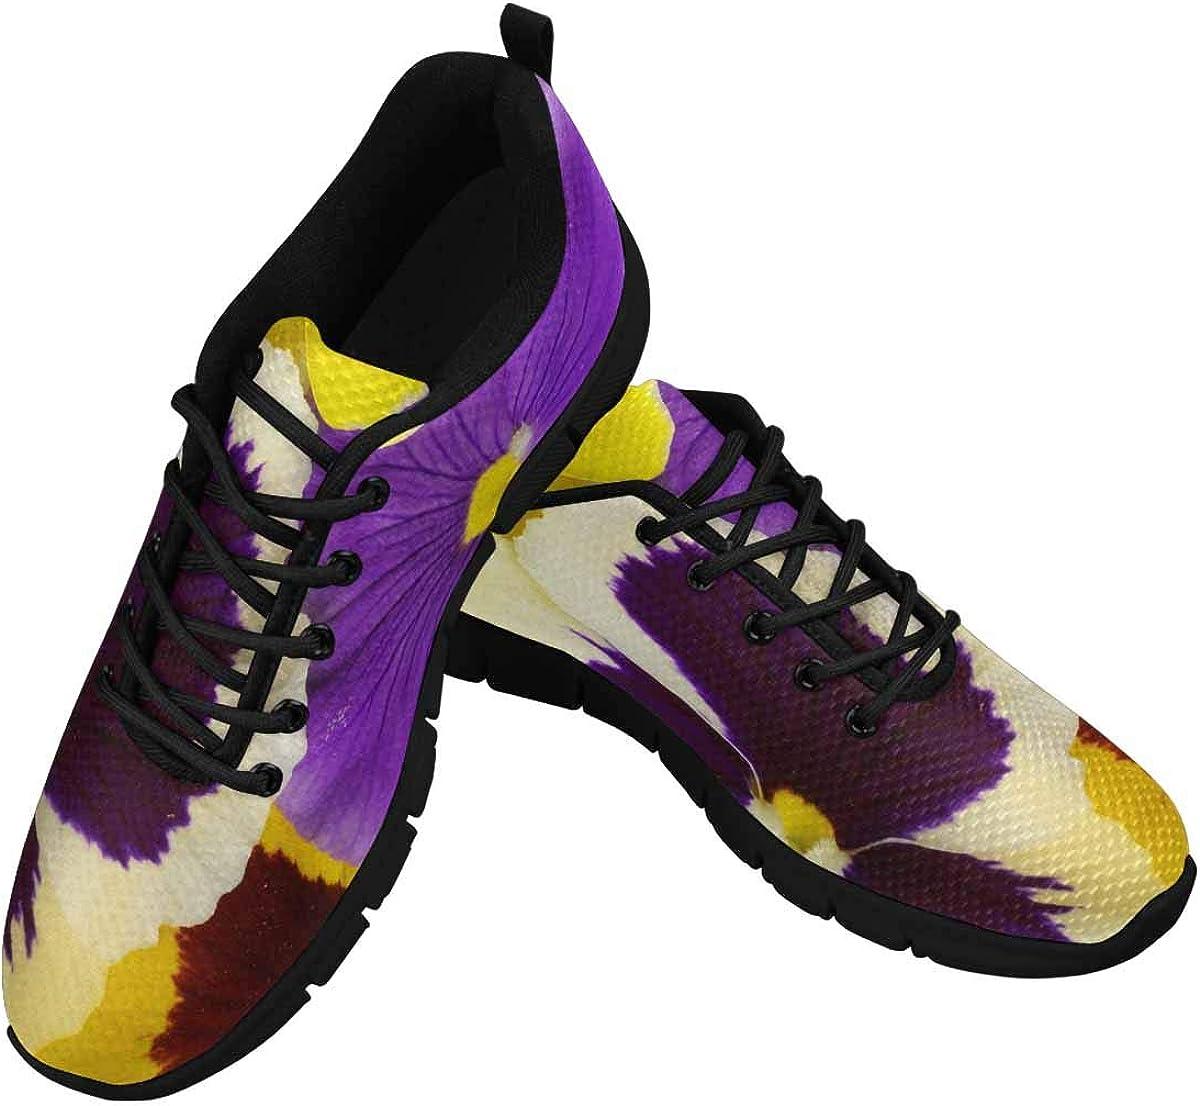 INTERESTPRINT Purple Yellow Flowers Women's Athletic Walking Running Sneakers Comfortable Lightweight Shoes